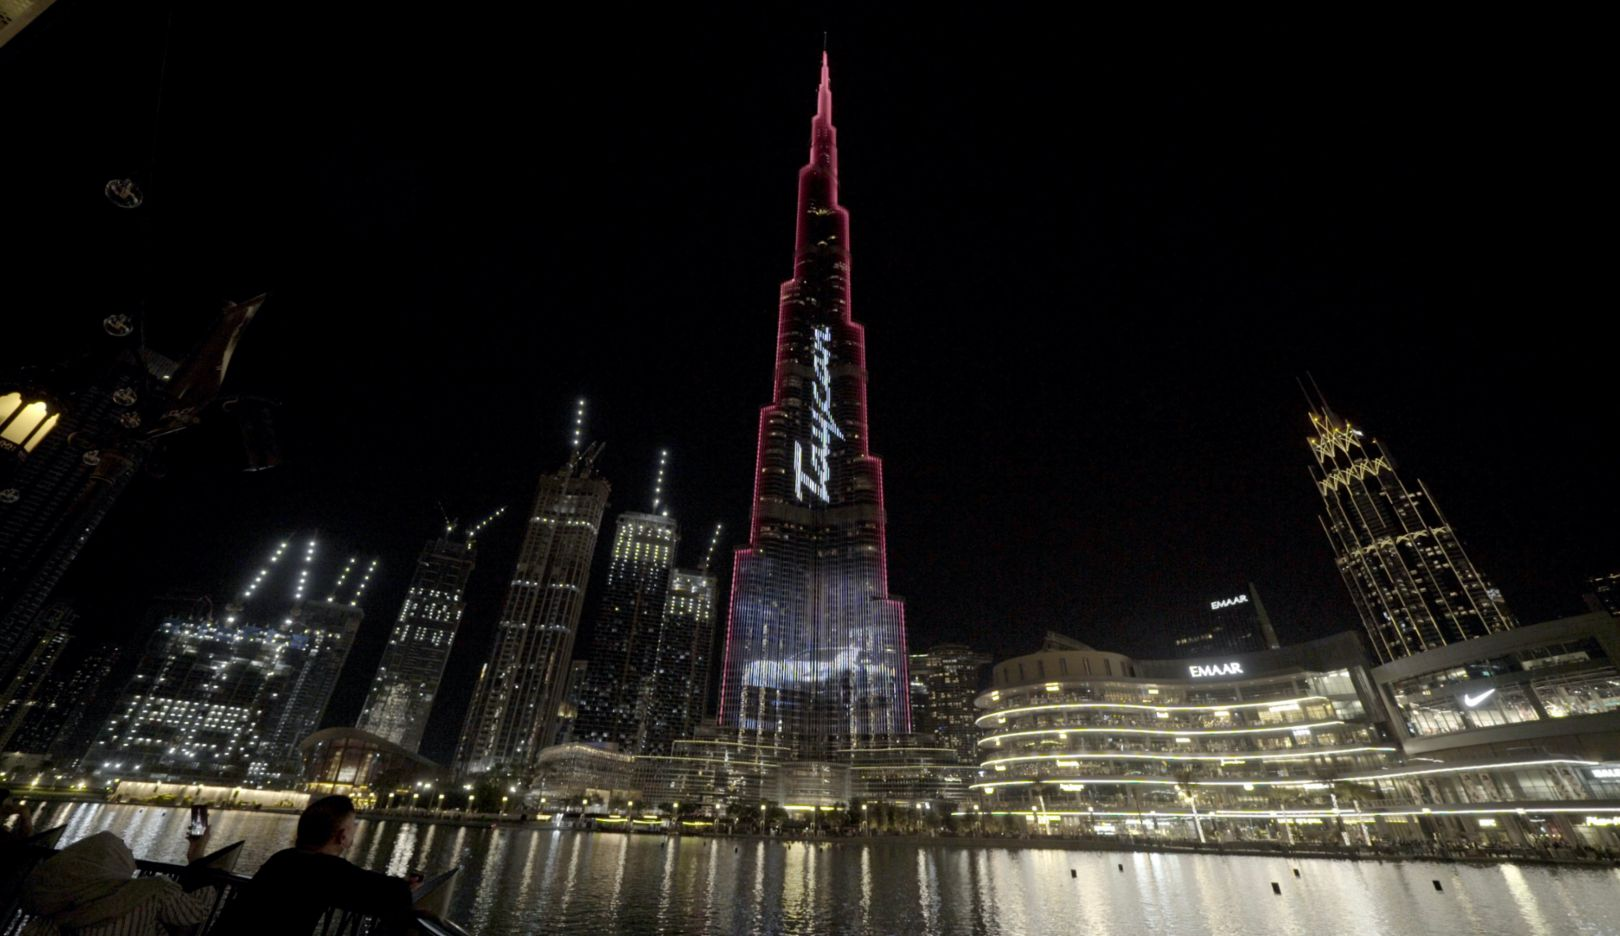 Porsche Taycan electrifies the world's tallest building: Dubai's Burj Khalifa - Image 3